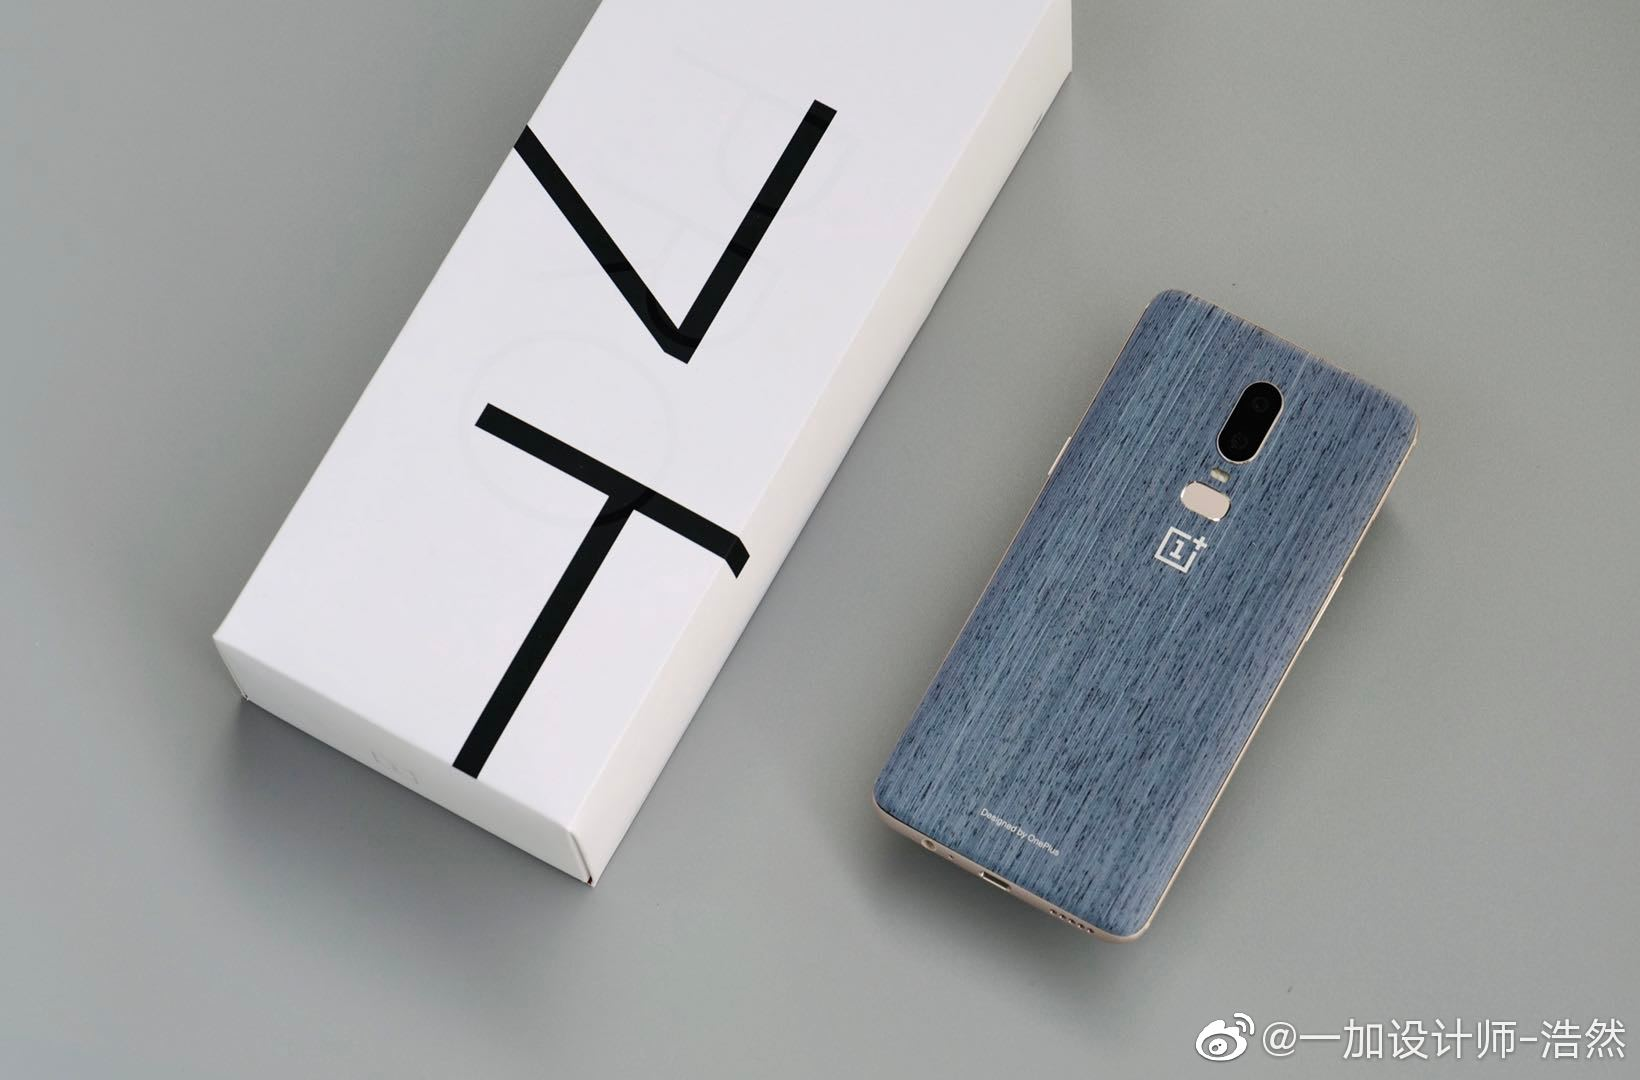 OnePlus 6 New Design